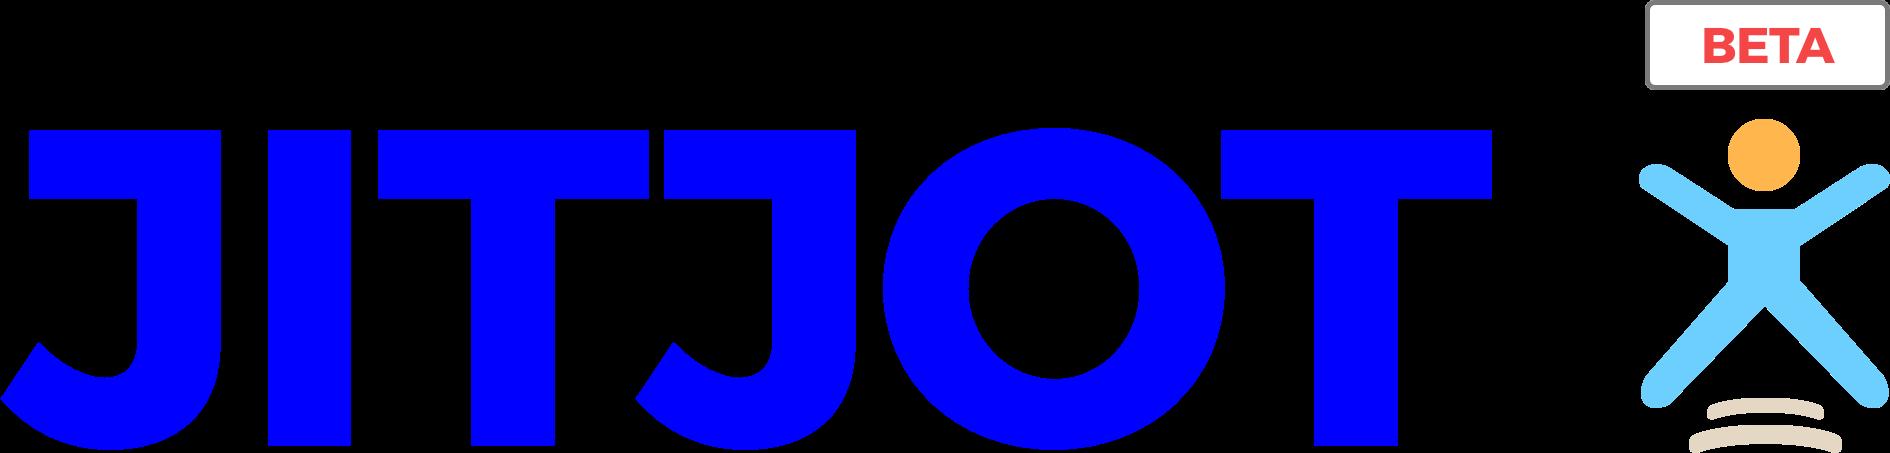 Login - JITJOT | www jitjot app